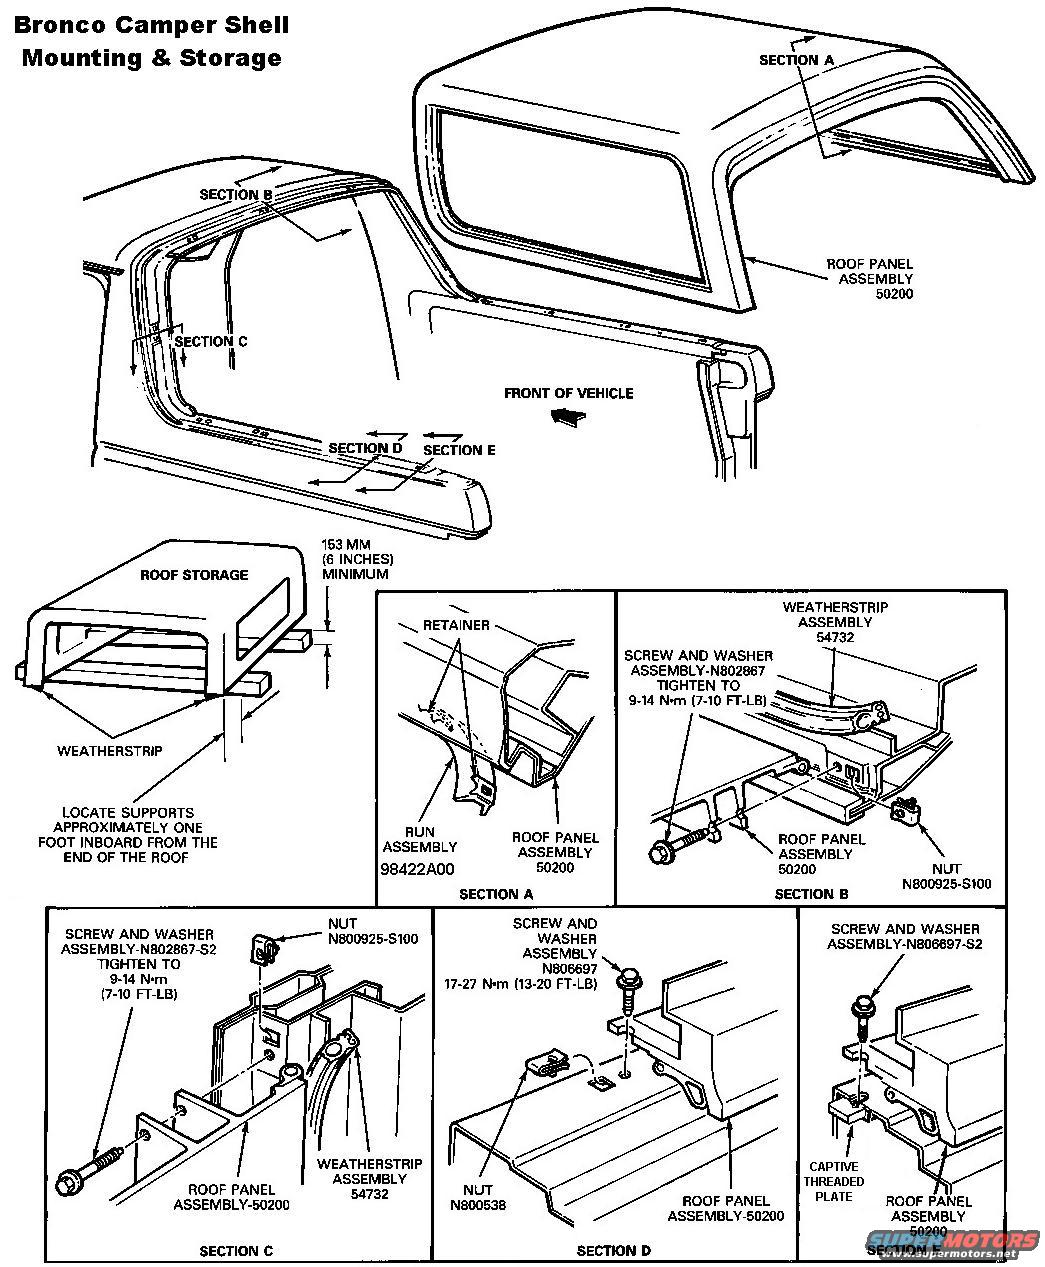 Canopy Bolt Hardware